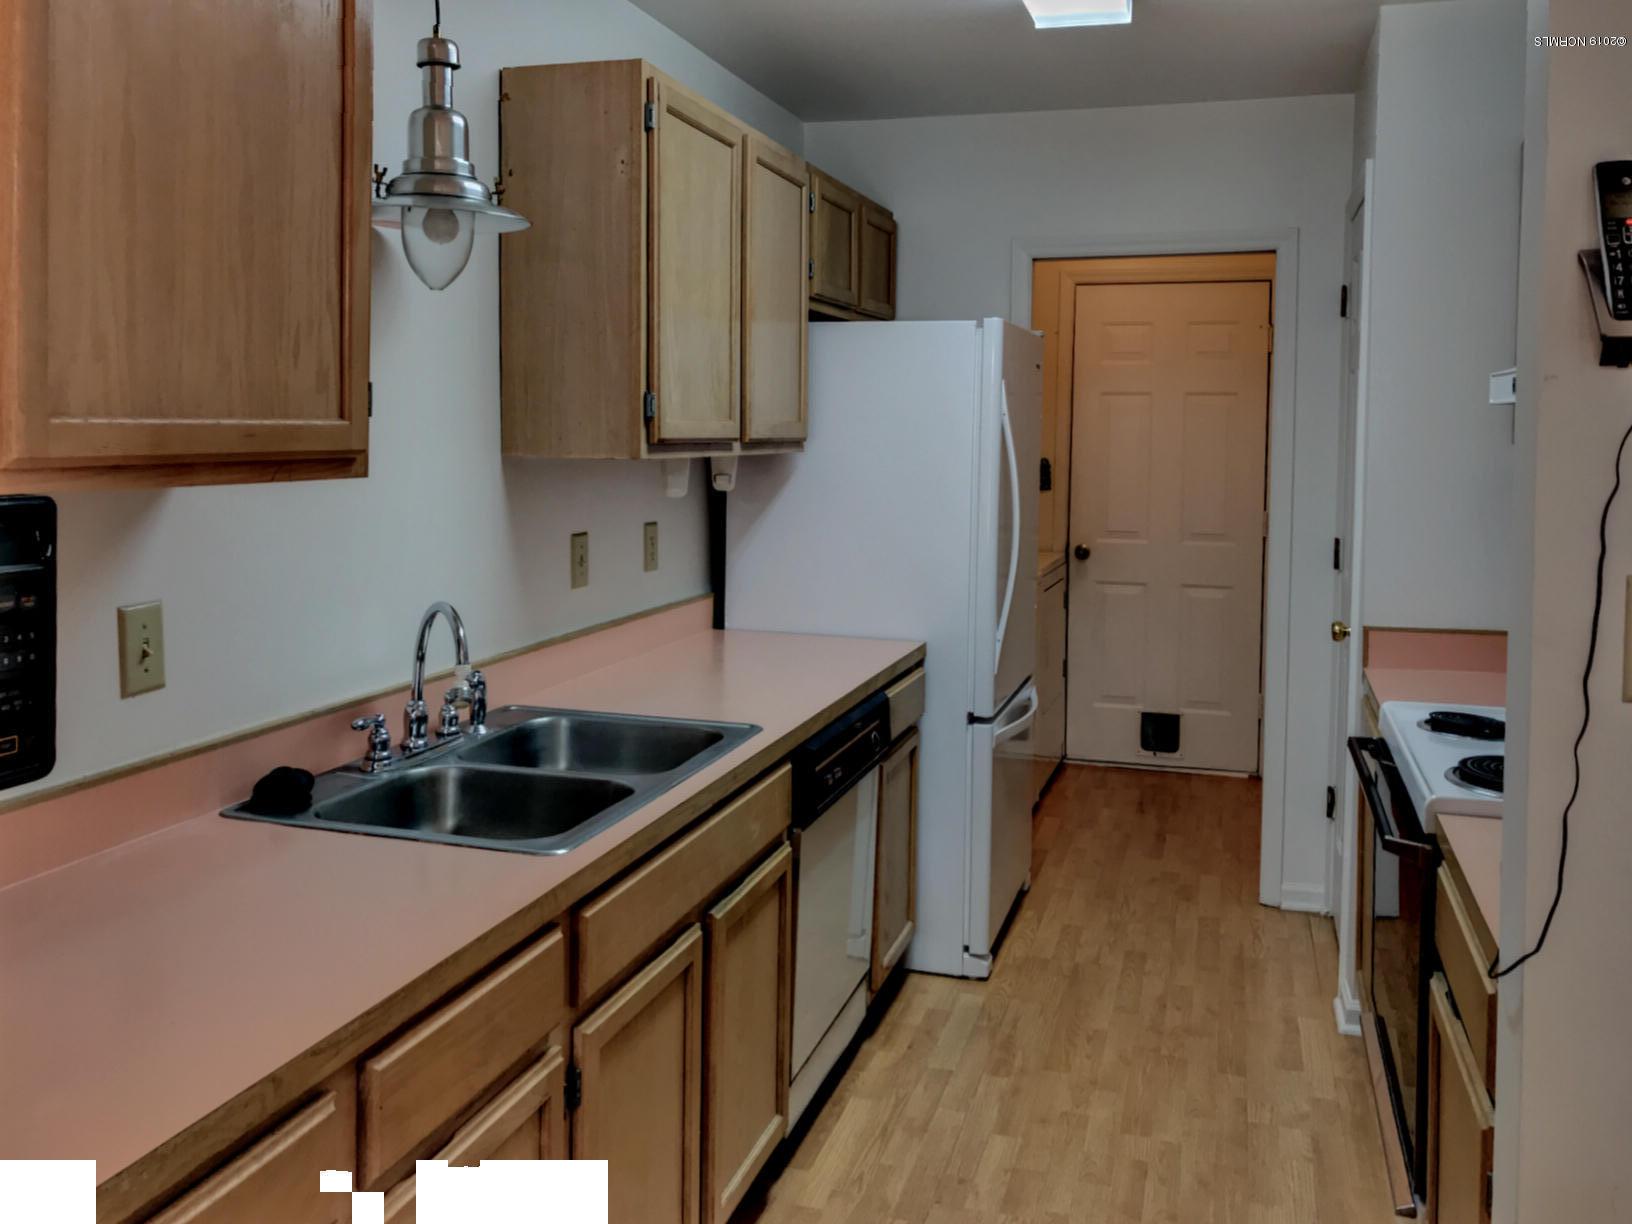 For Sale - 1302 Cedarwood Village Morehead City NC 28557  